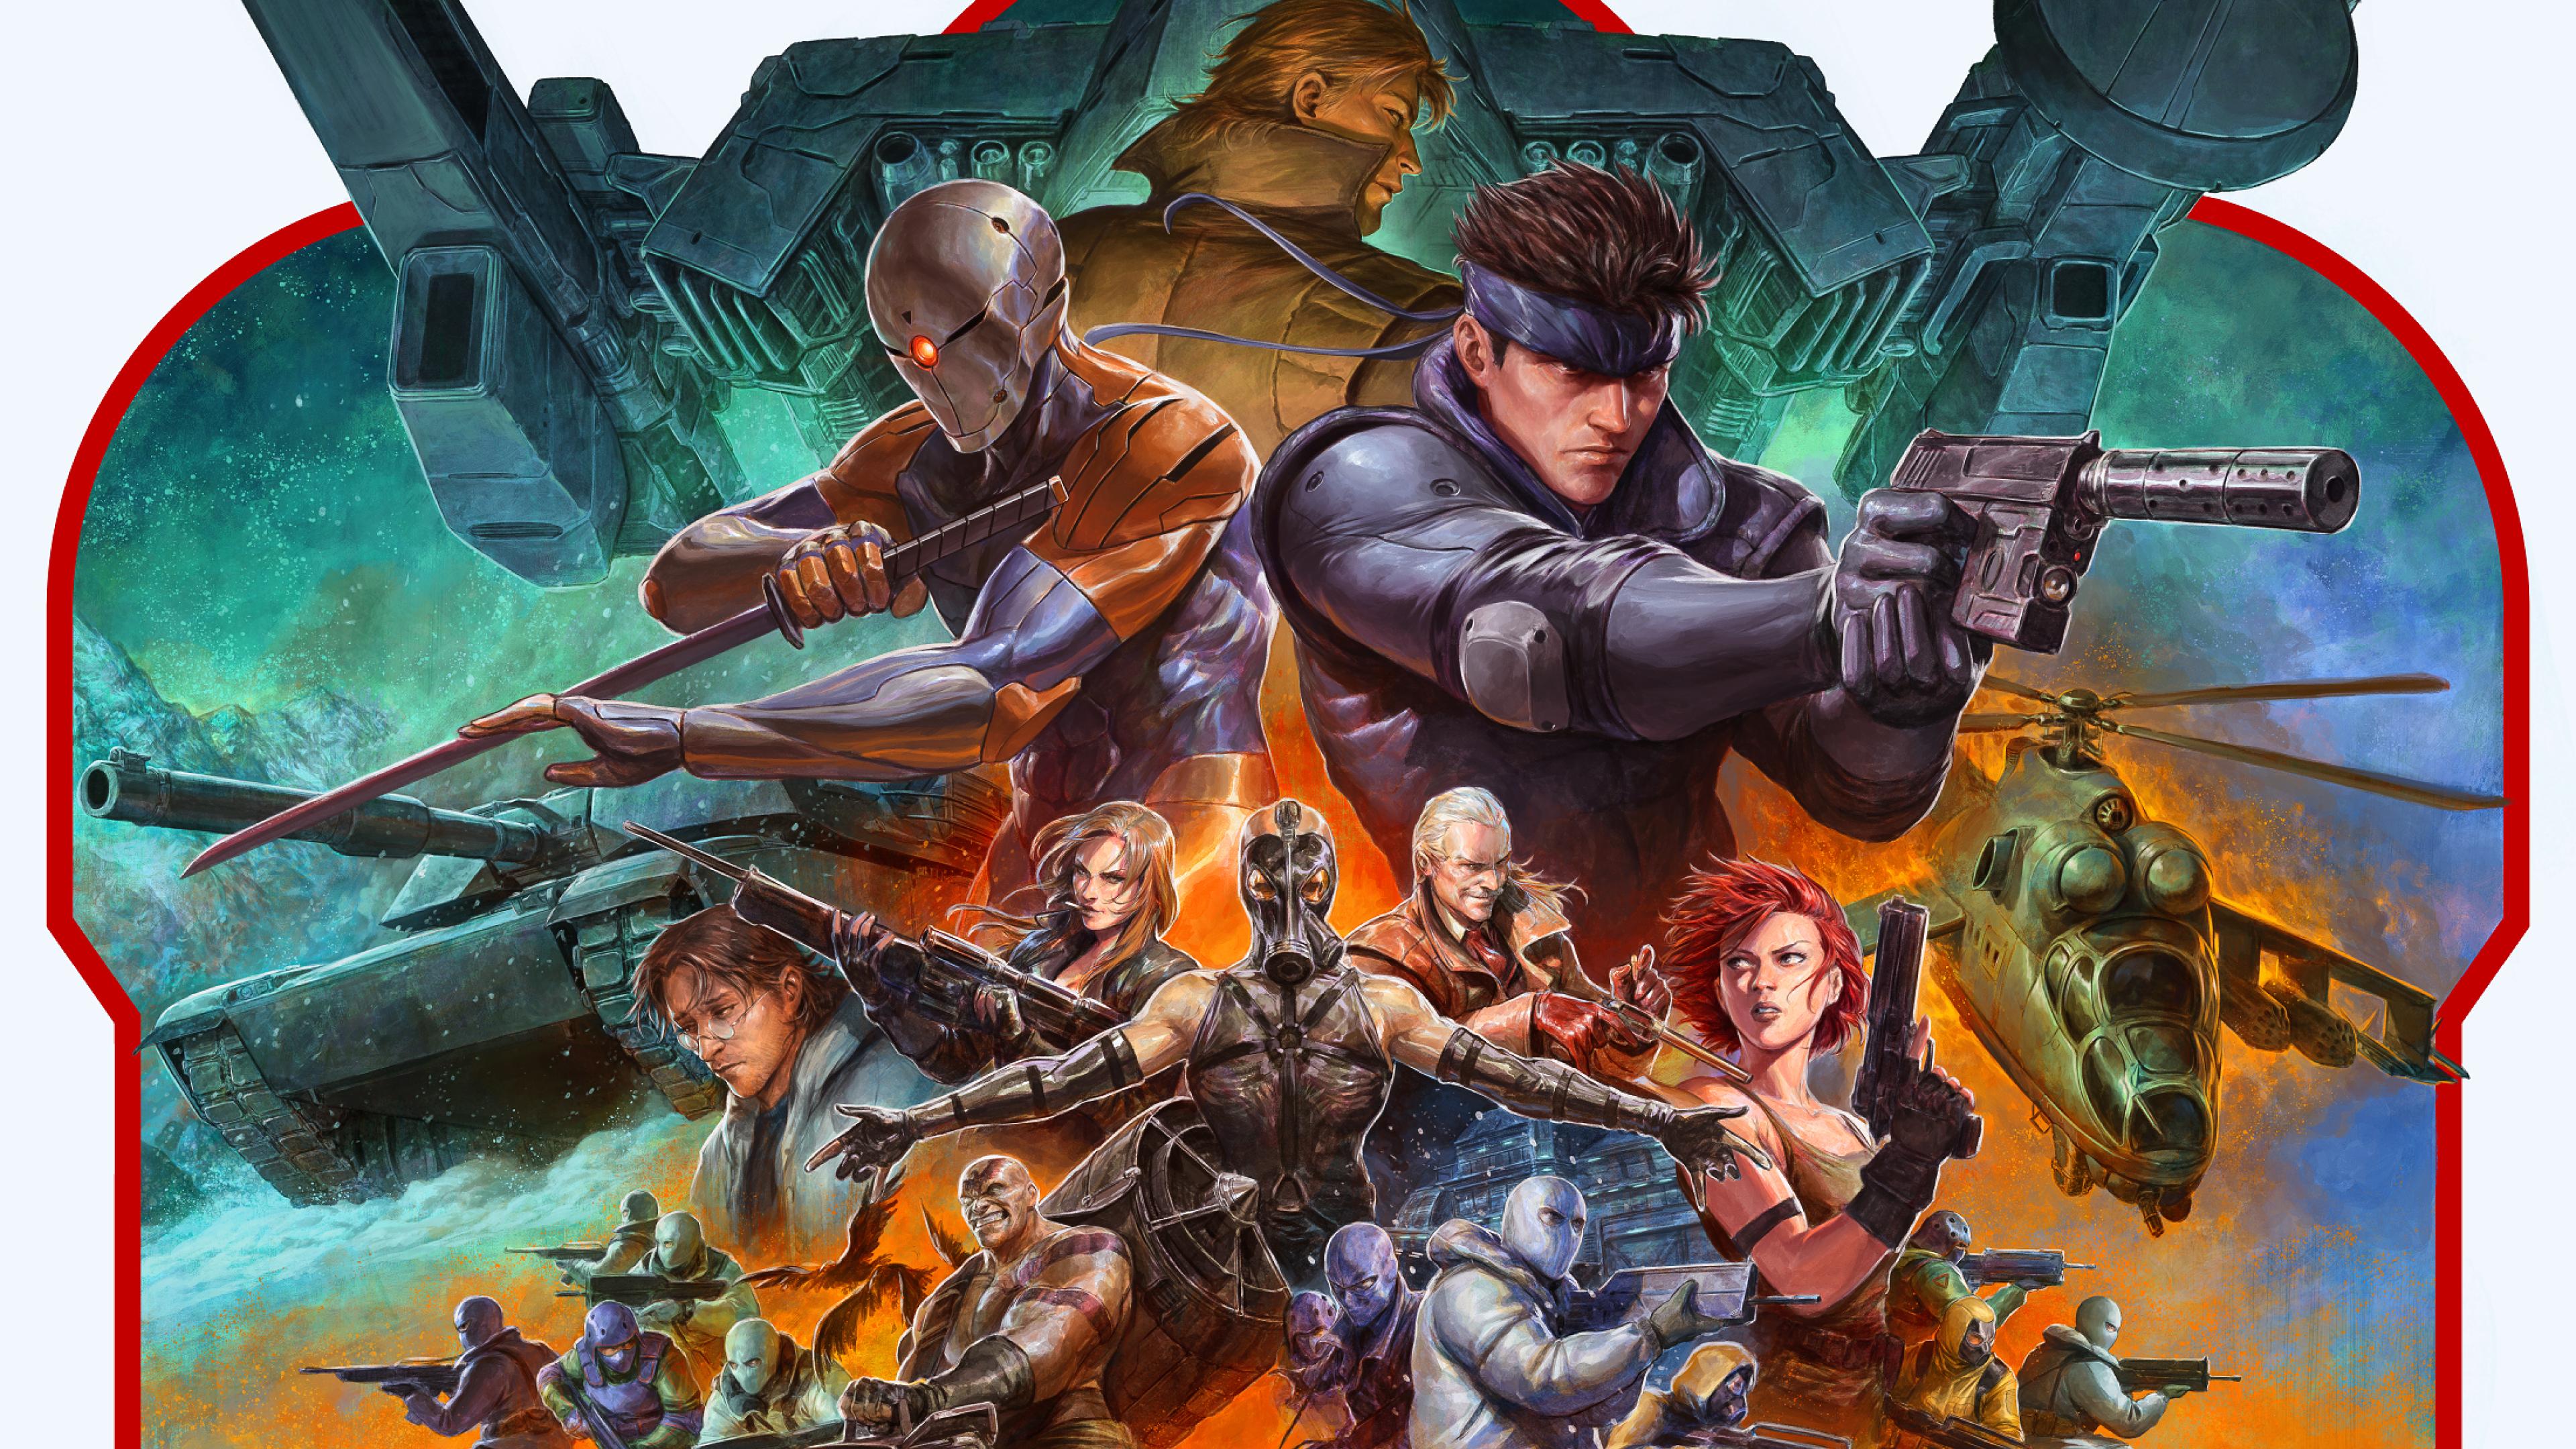 3840x2160 Solid Snake Metal Gear Solid 4K Wallpaper, HD ...